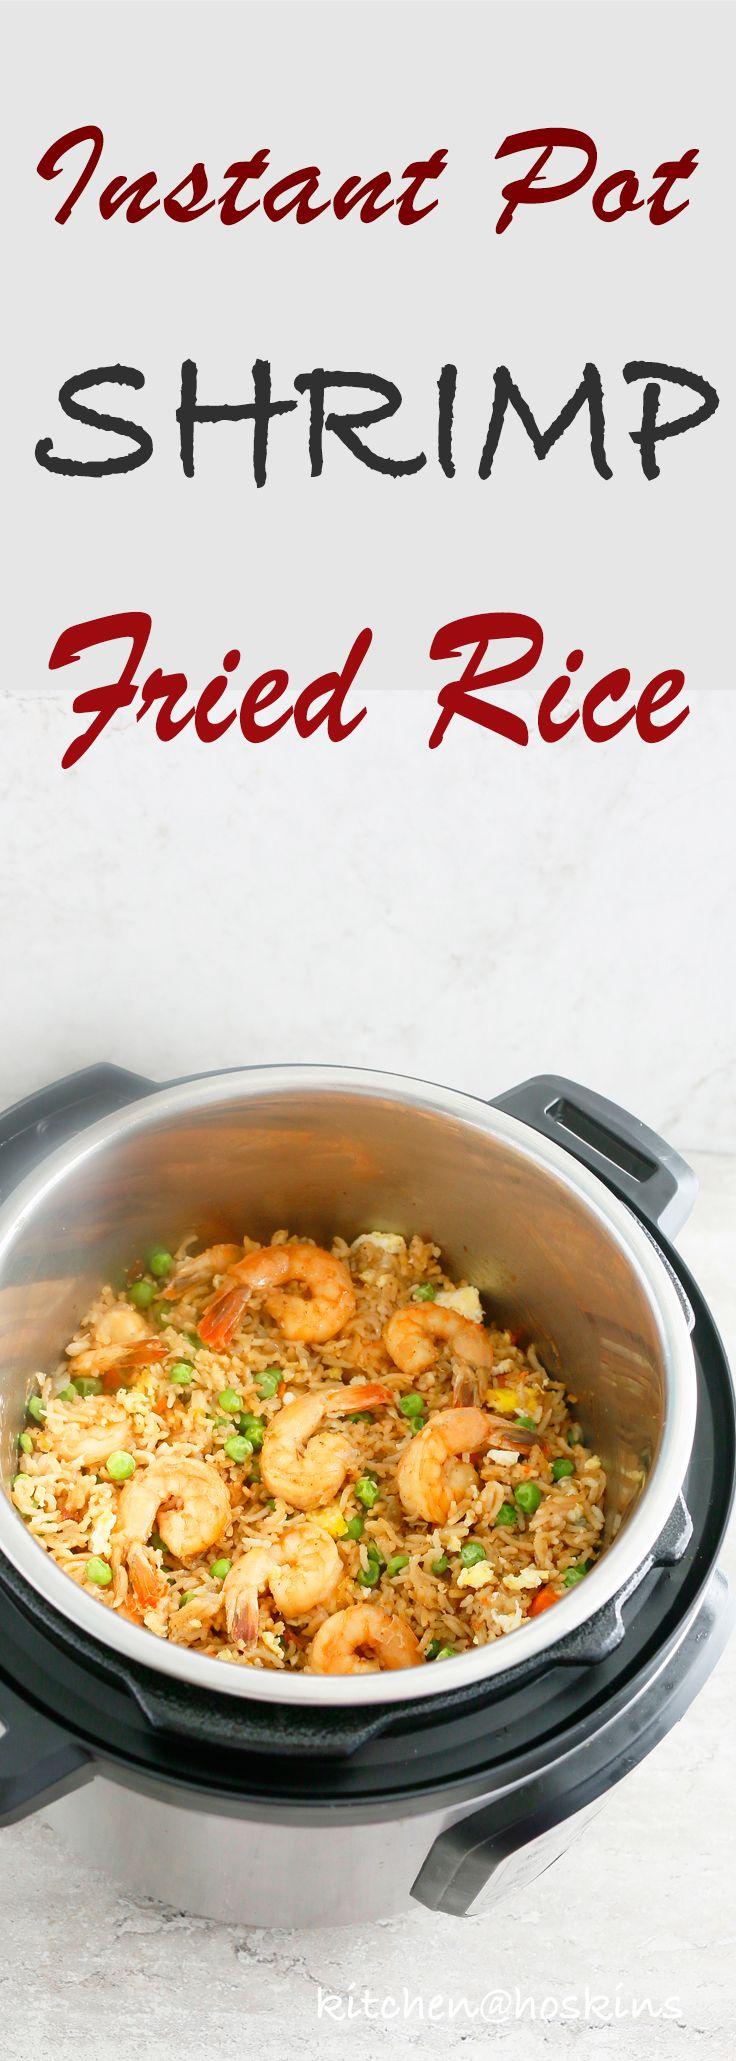 Instant Pot Shrimp Gebratener Reis